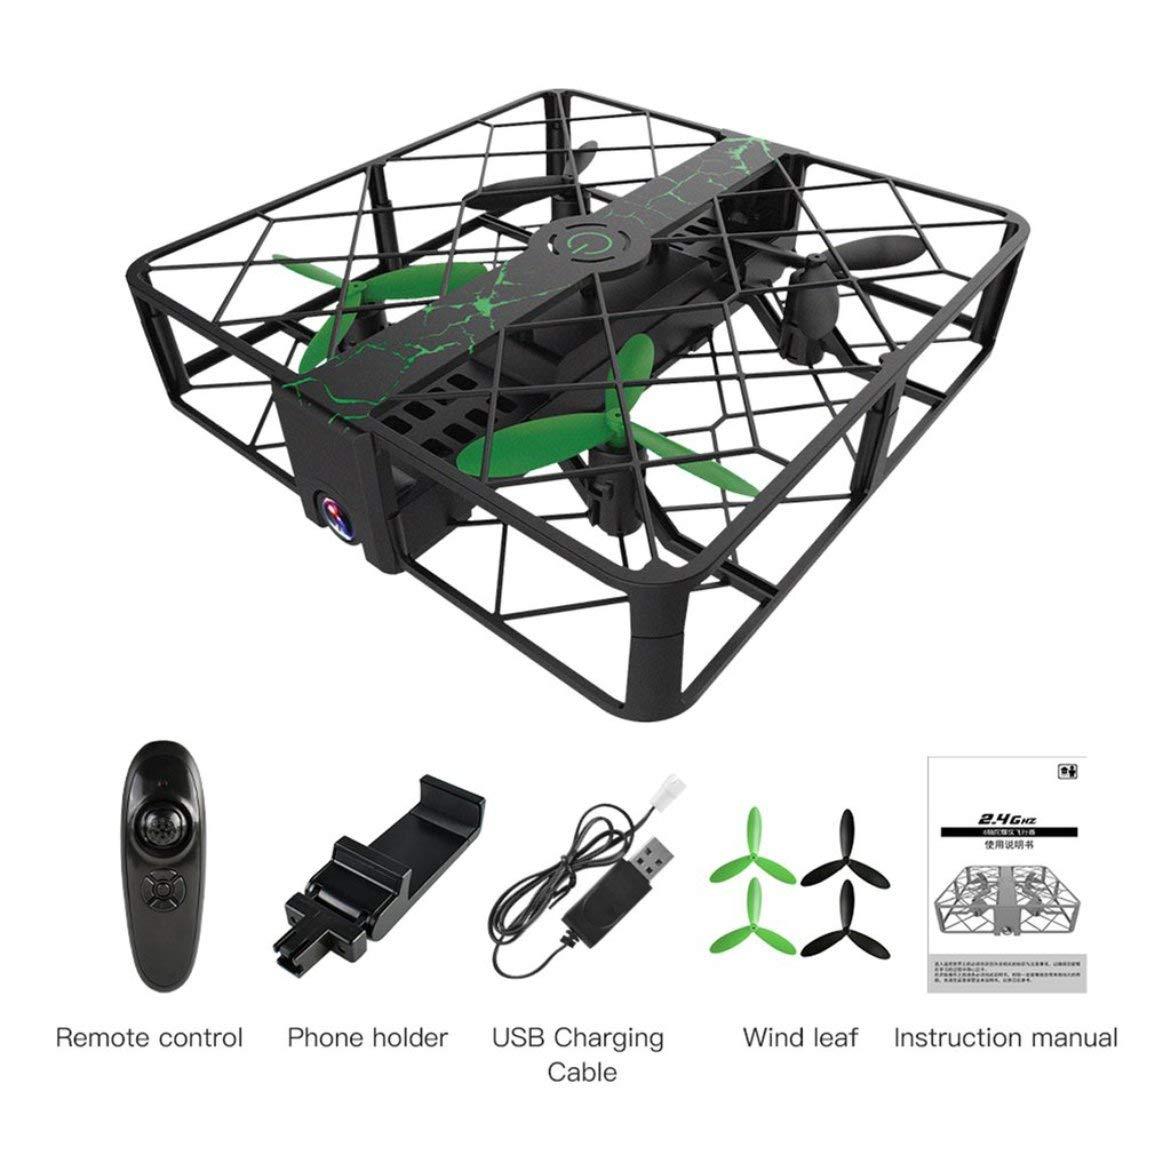 Fantasyworld SG500 Mini-Drohne Shatter Resistant WiFi WiFi WiFi Fern Quadcopter mit 0.3MP Kamera 4CH Altitude Halten Headless Modus RC Hubschrauber 19b006